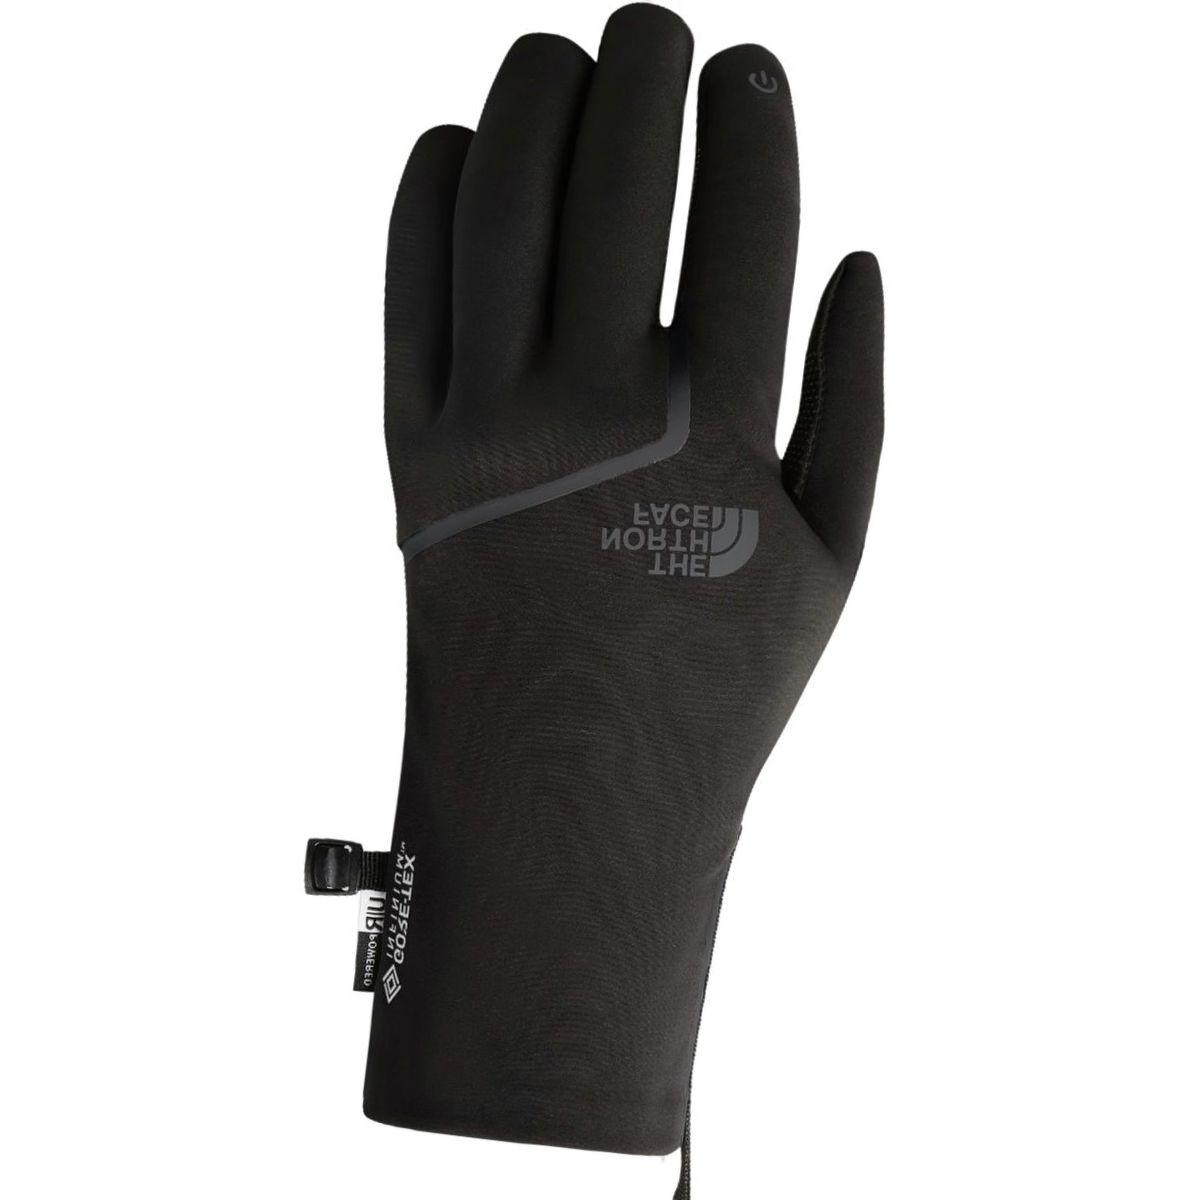 The North Face CloseFit Gore Soft Shell Glove - Men's